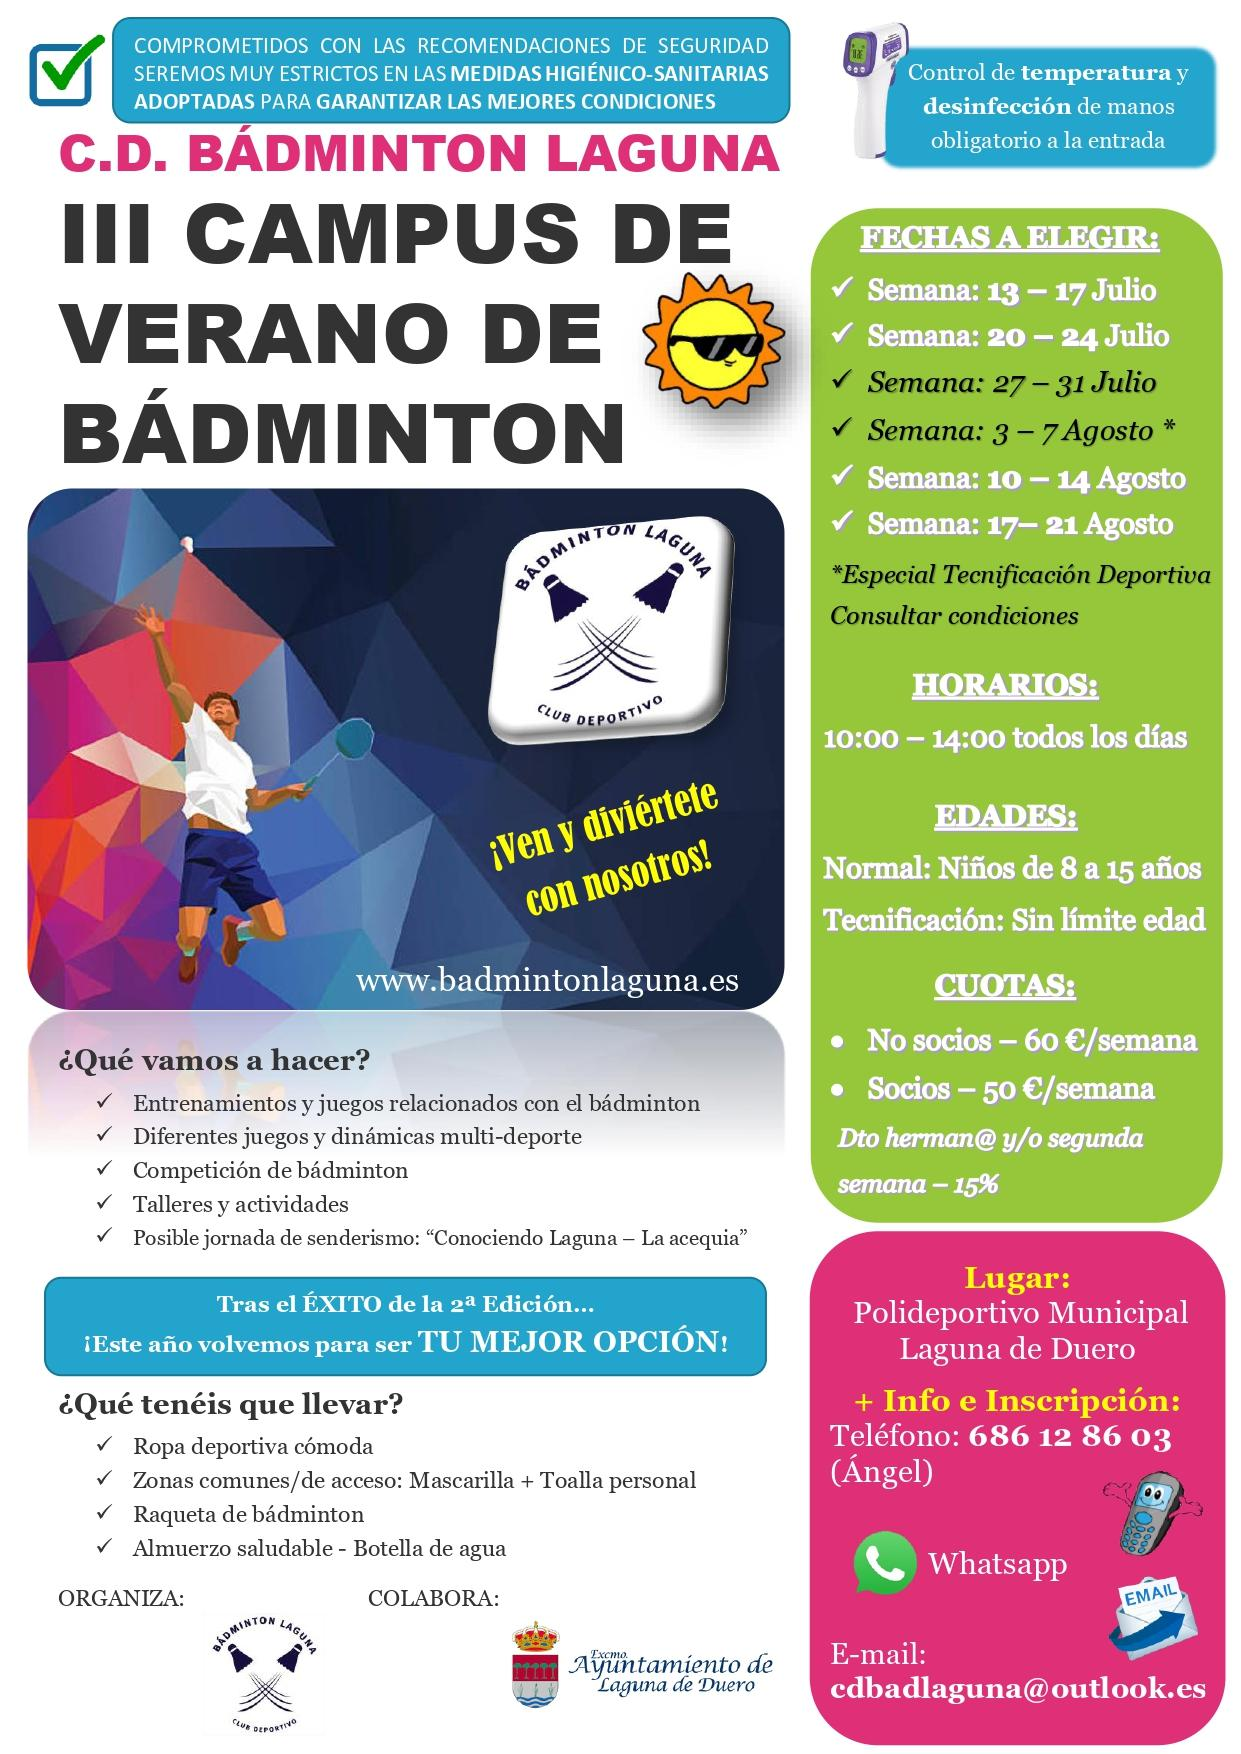 Iii campus de verano c d badminton laguna 1